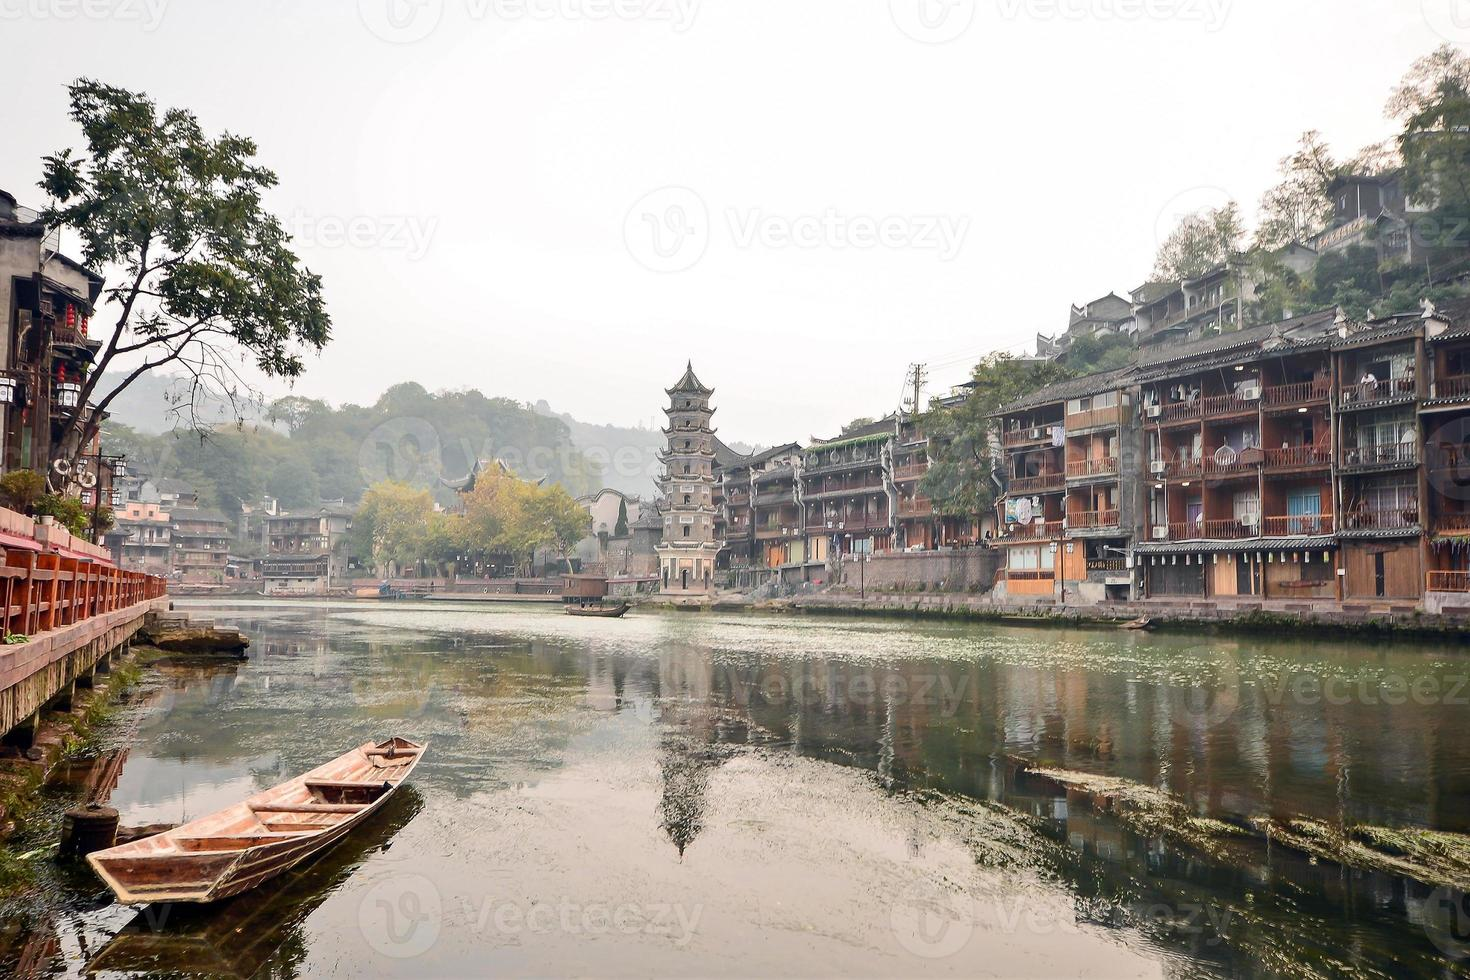 tuojiang rivier foto